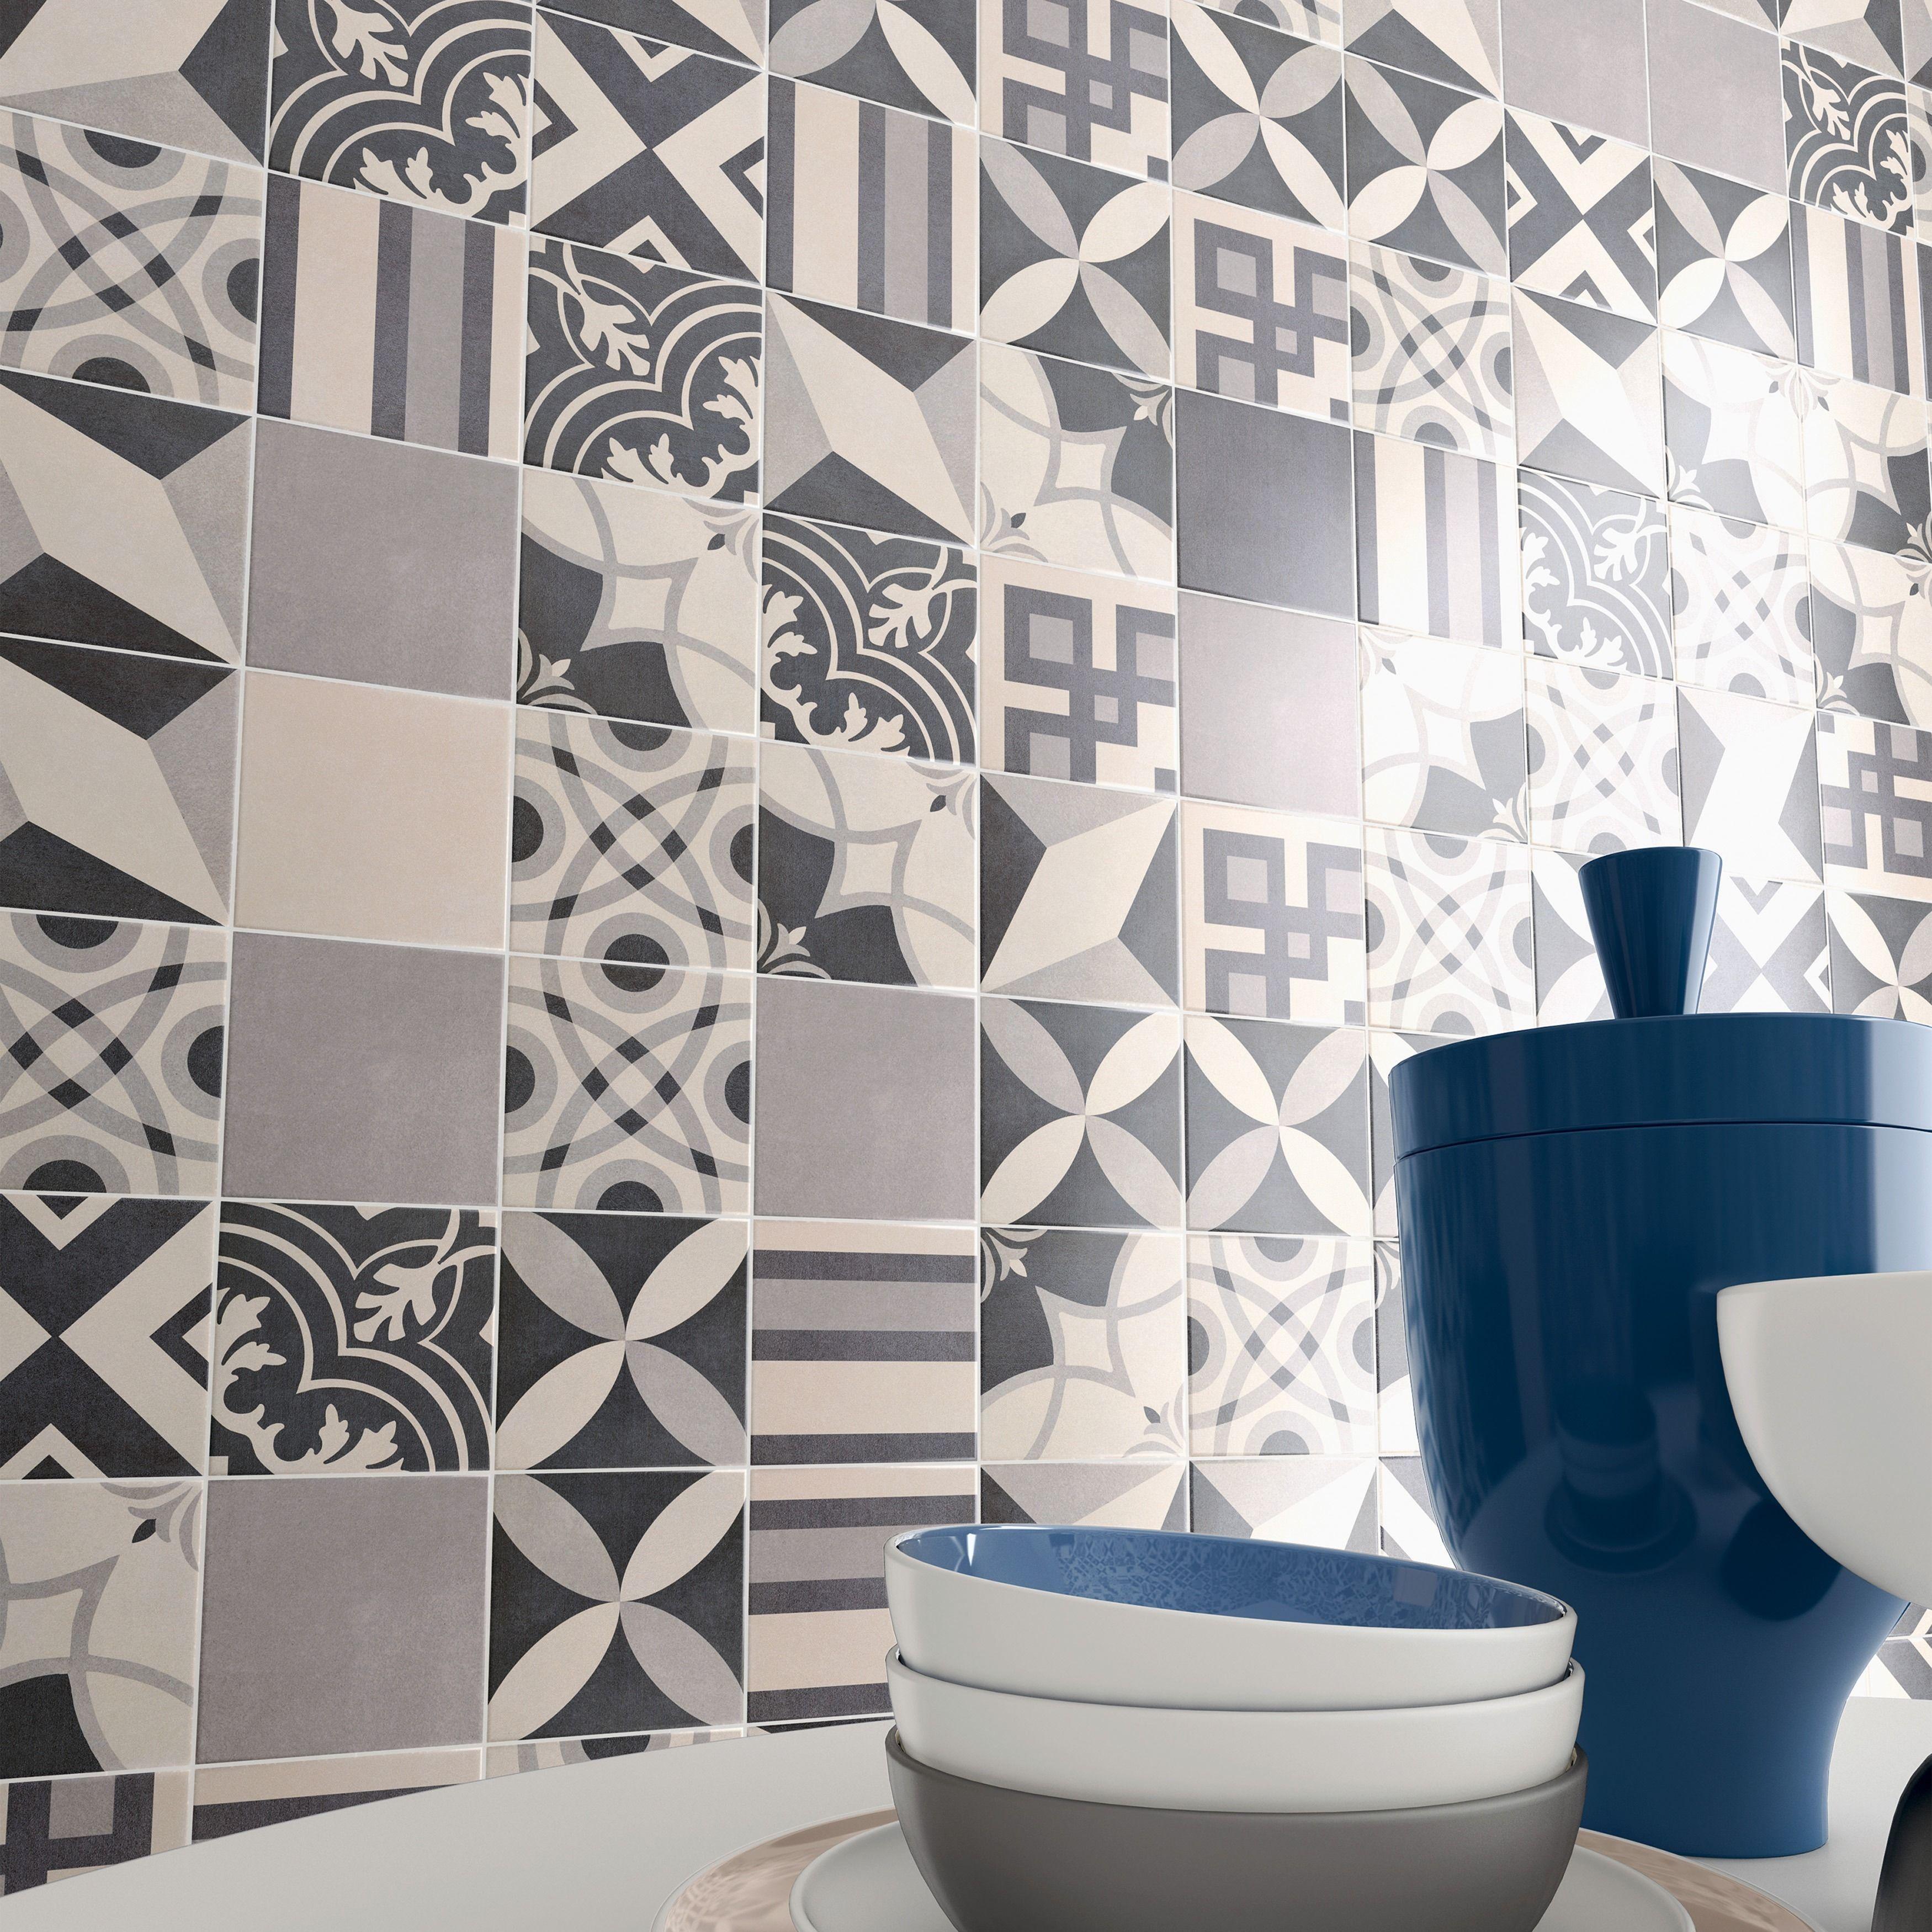 Somertile 7 75x7 75 Inch Thirties Petal Ceramic Floor And Wall Tile 25 Tiles 11 Sqft Ceramic Floor Patchwork Tiles Flooring